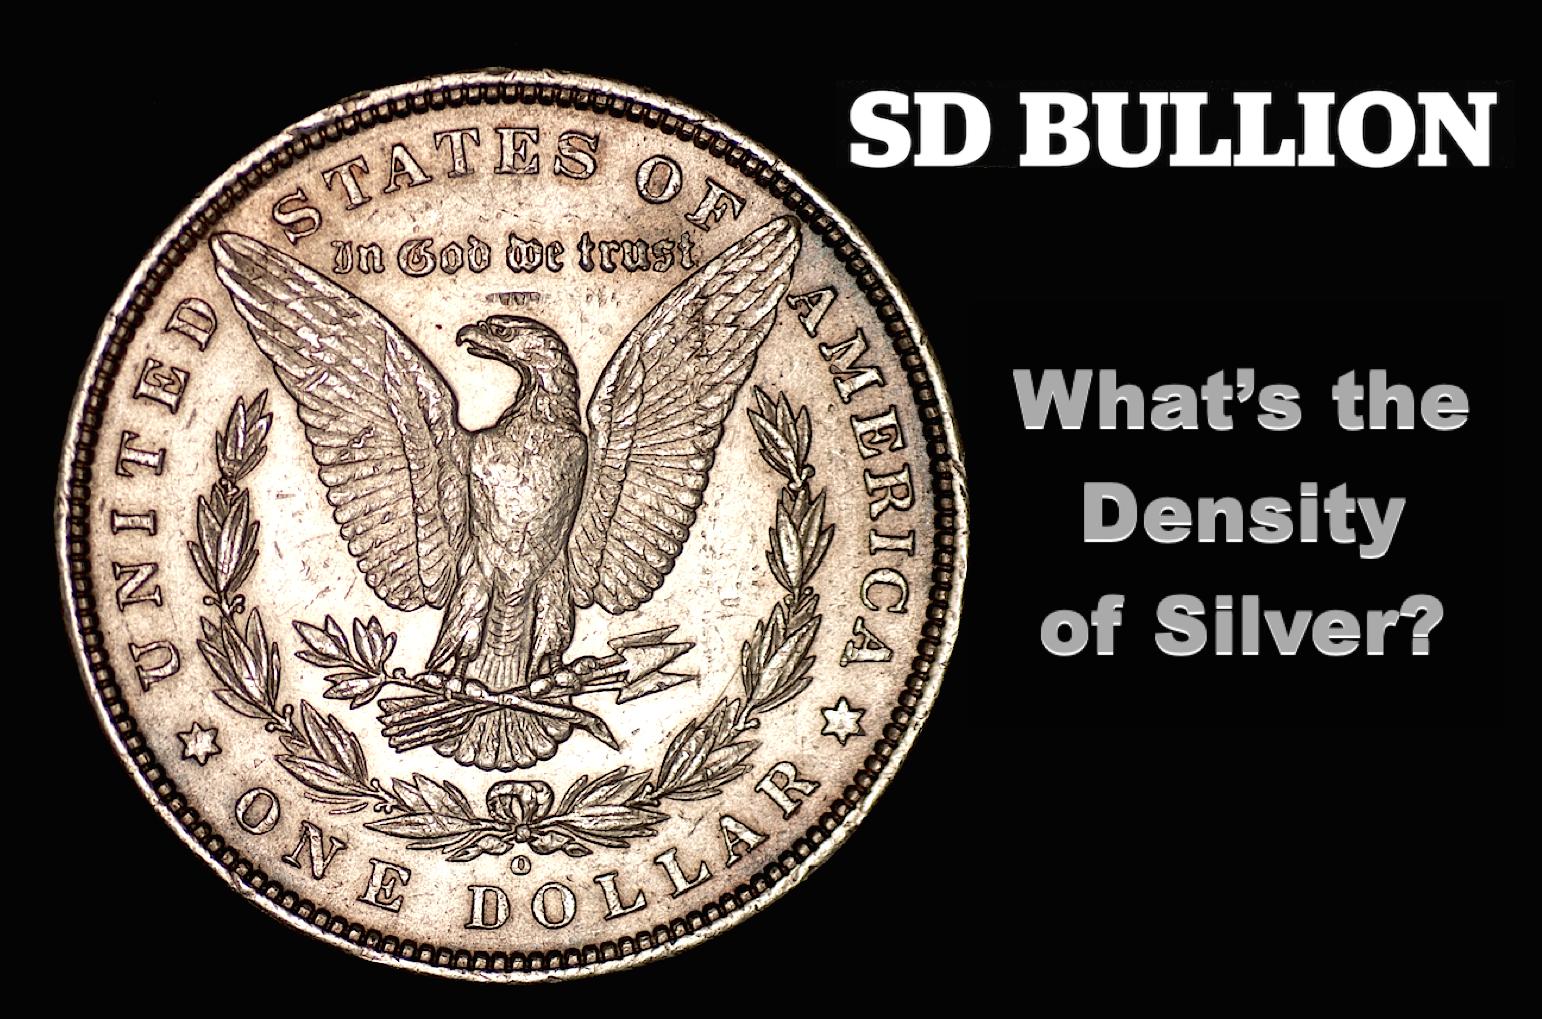 Density of Silver?